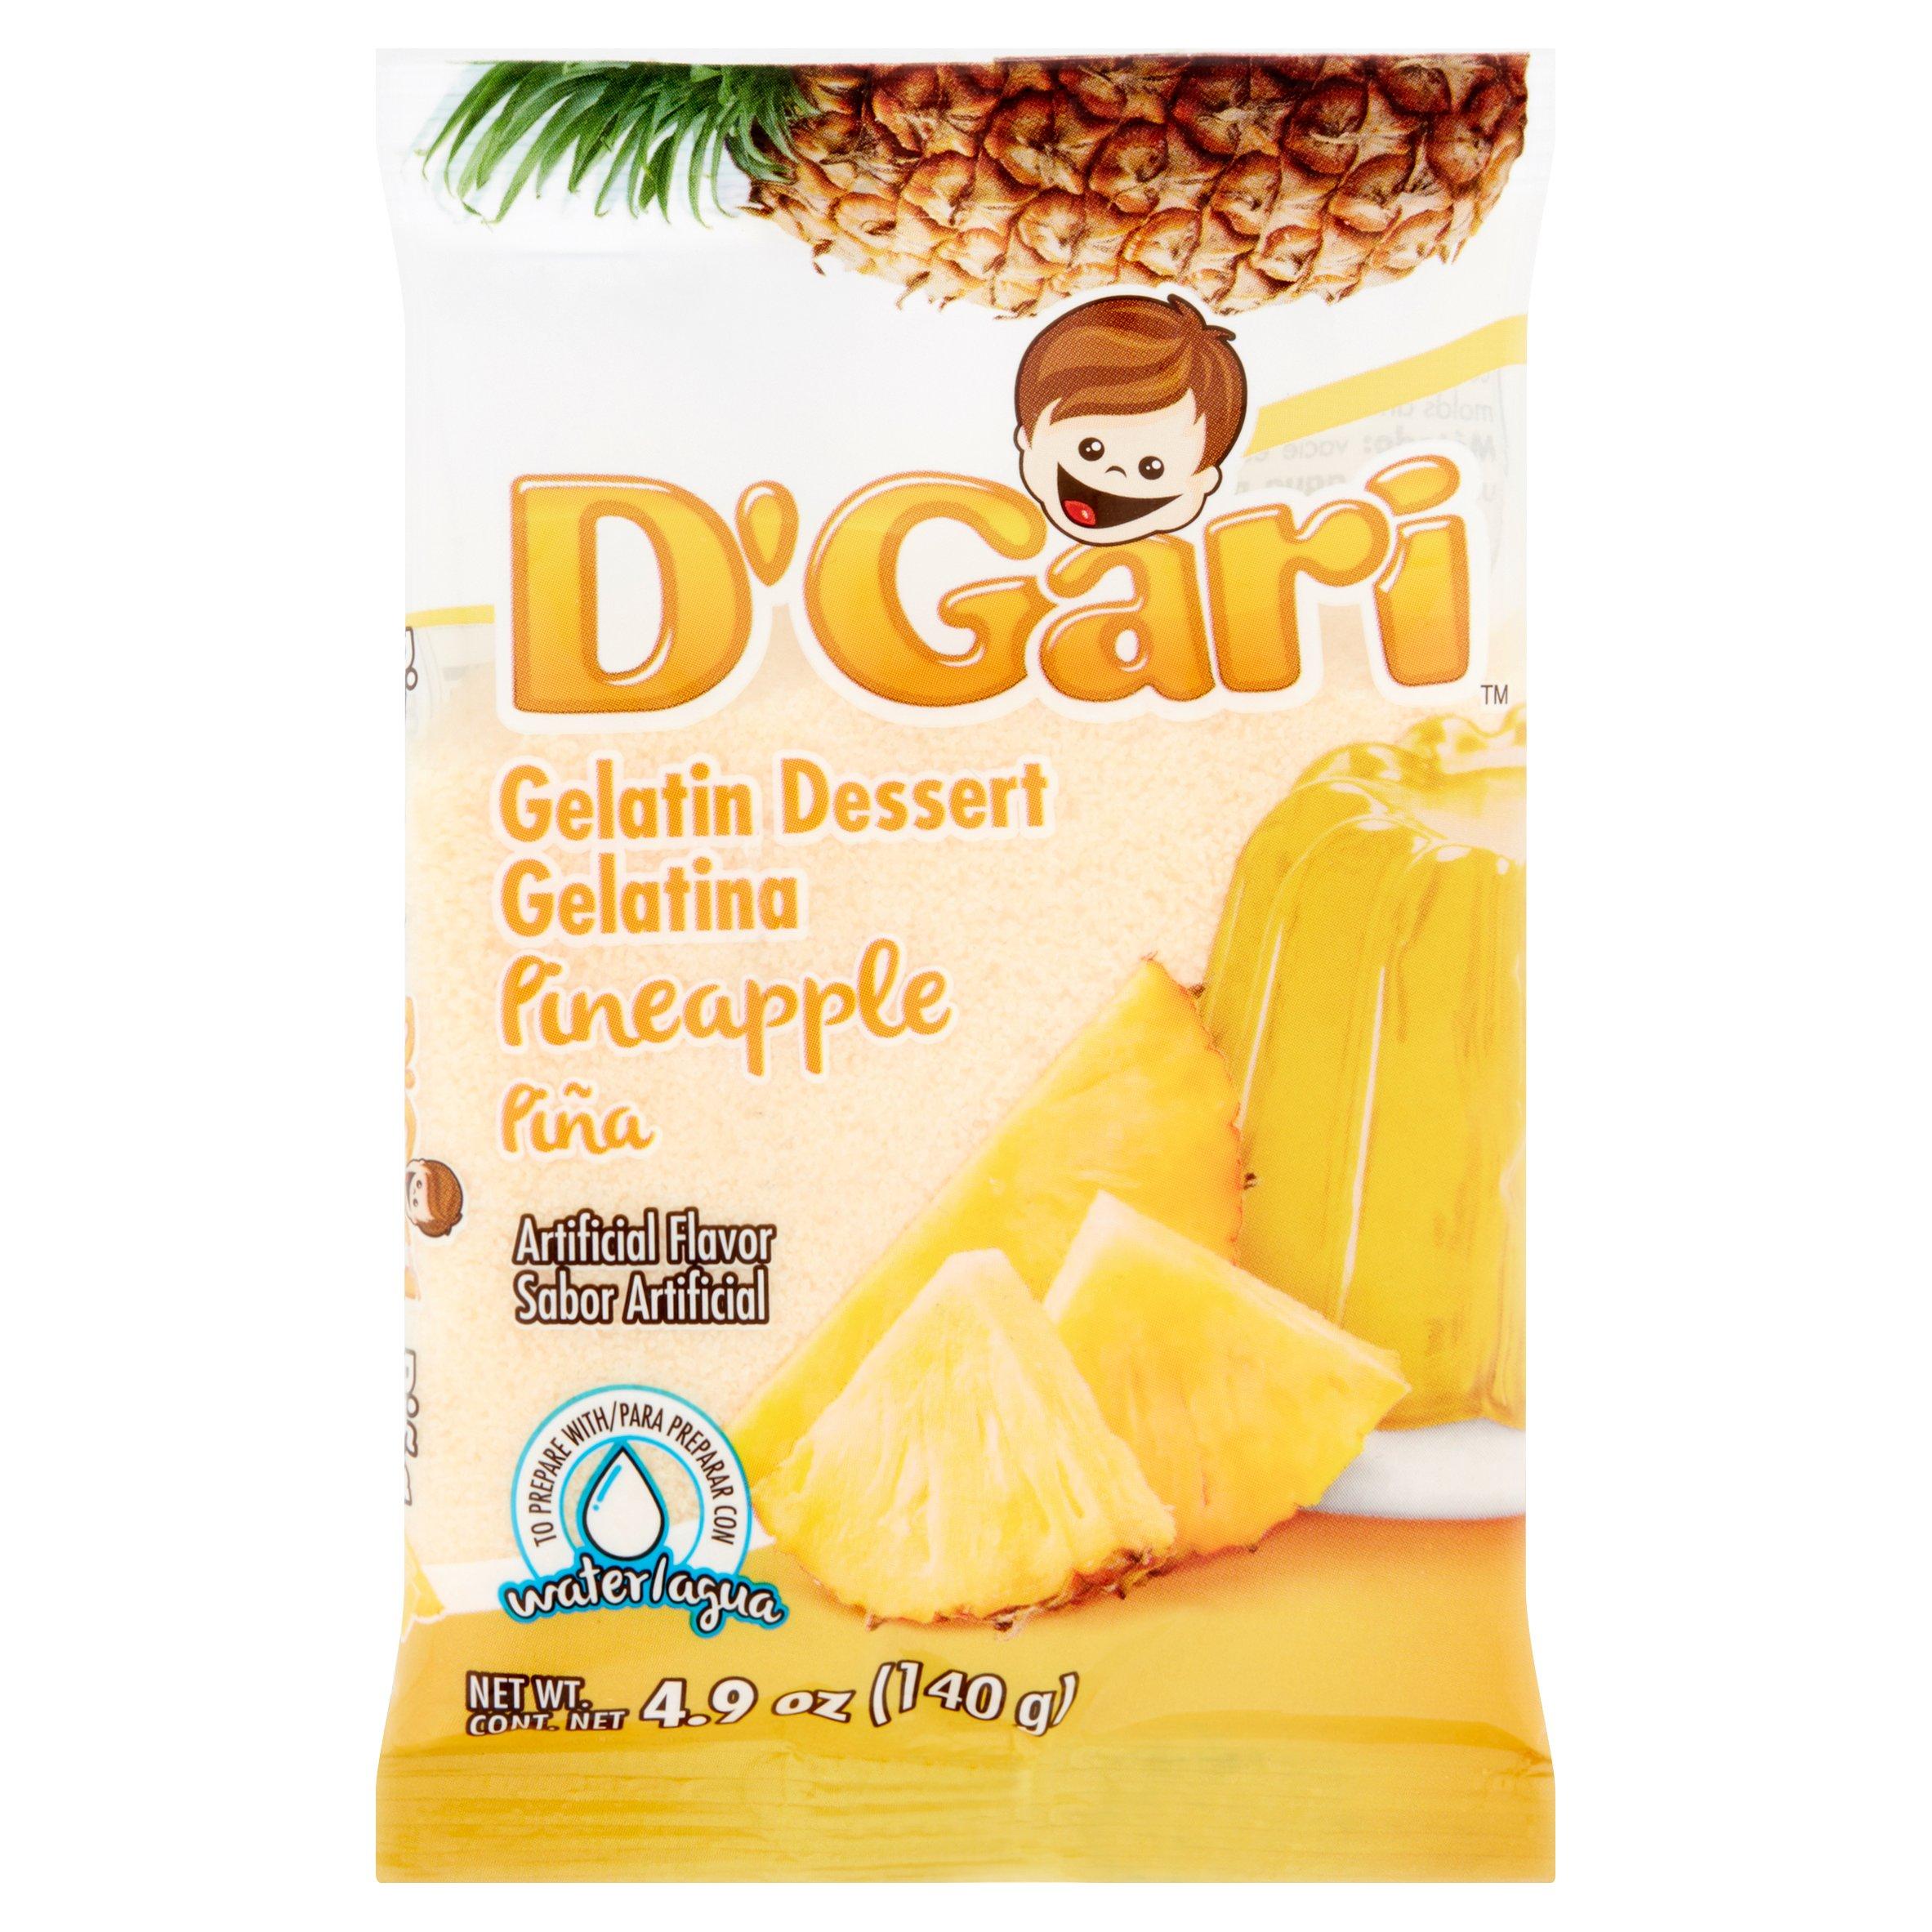 D'Gari Pineapple Gelatin Dessert, 4.9 oz by Productos Alimenticious Y Dieteticos Relampago, S.A. DE C.V.